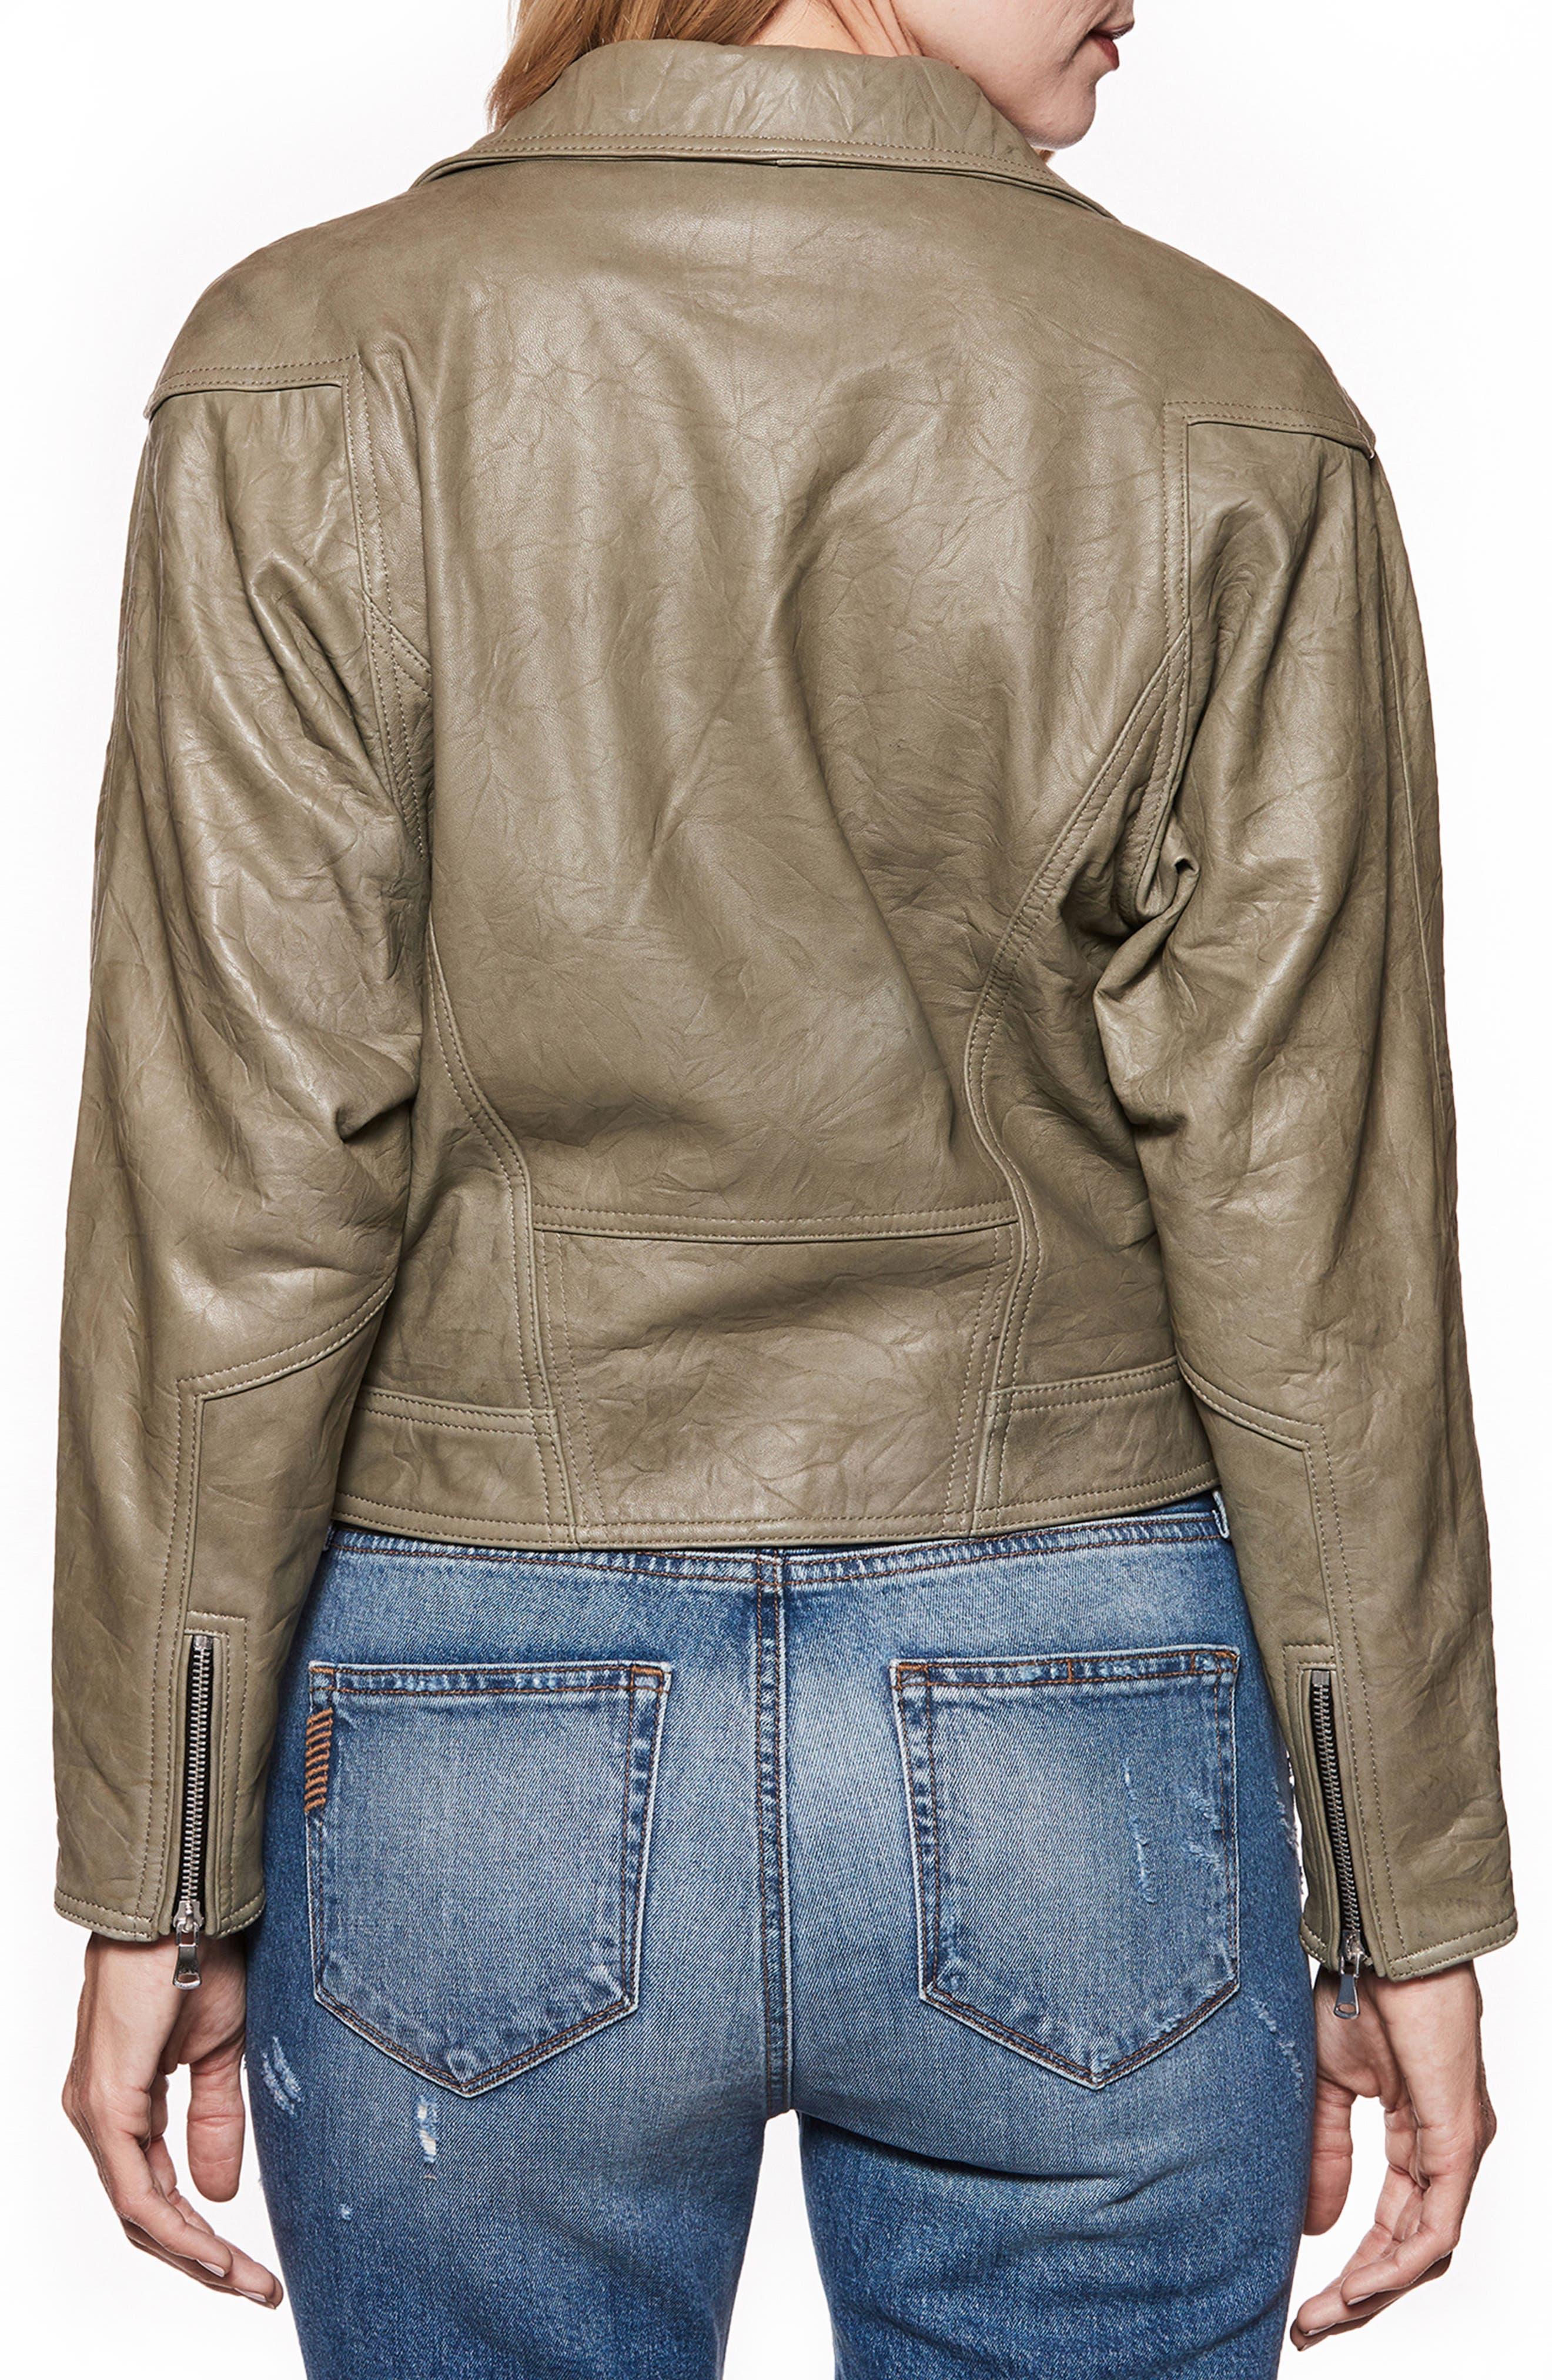 Sivan Leather Moto Jacket,                             Alternate thumbnail 2, color,                             300